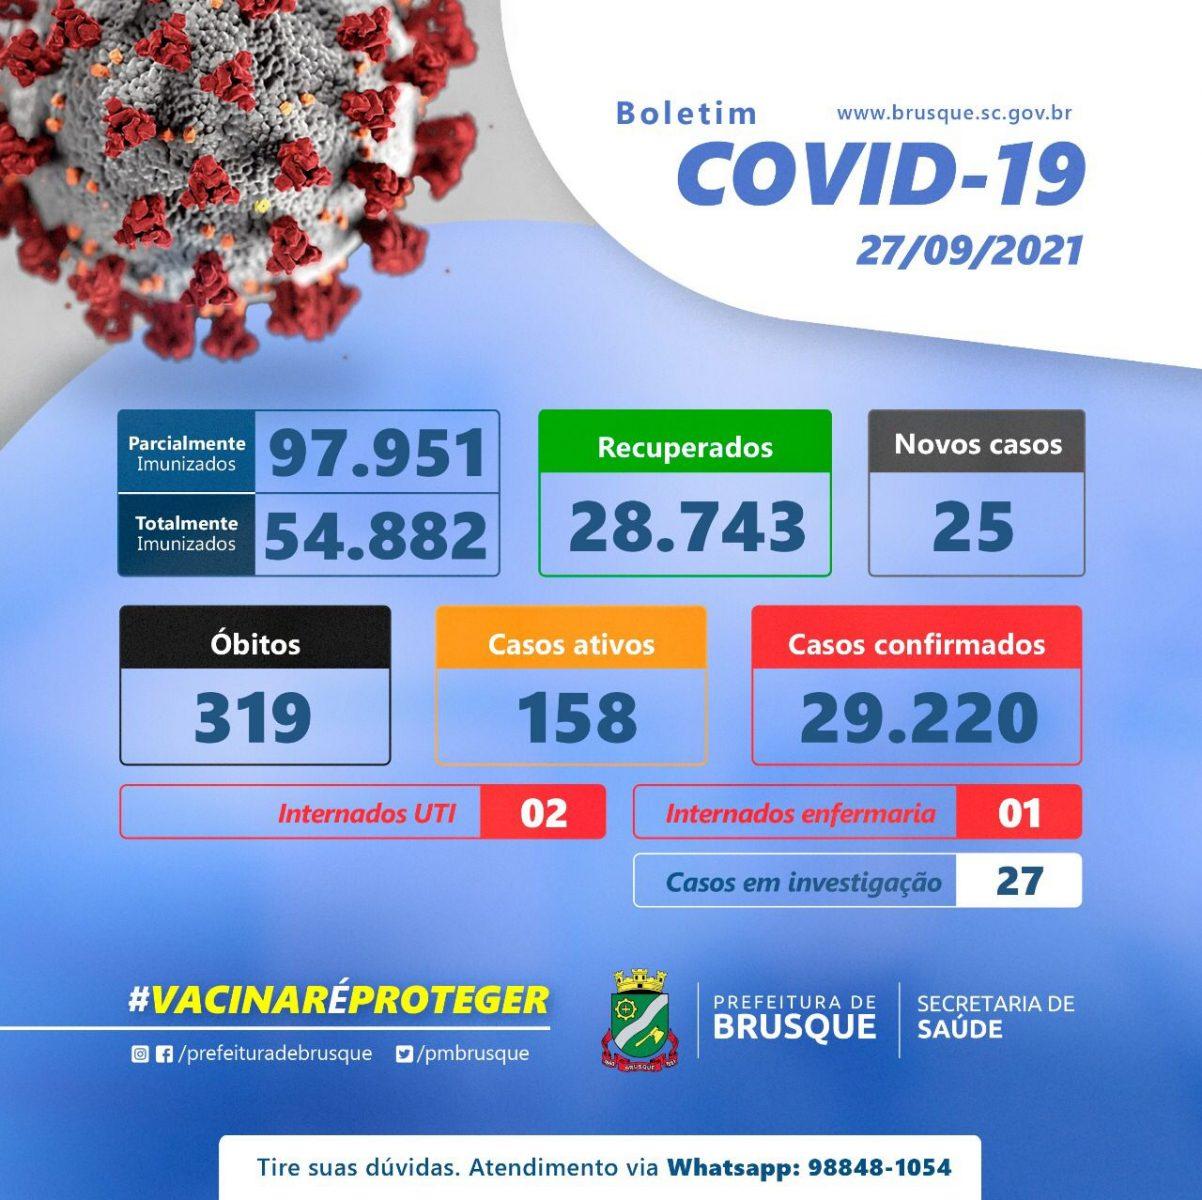 Covid-19: Confira o boletim epidemiológico desta segunda-feira (27)